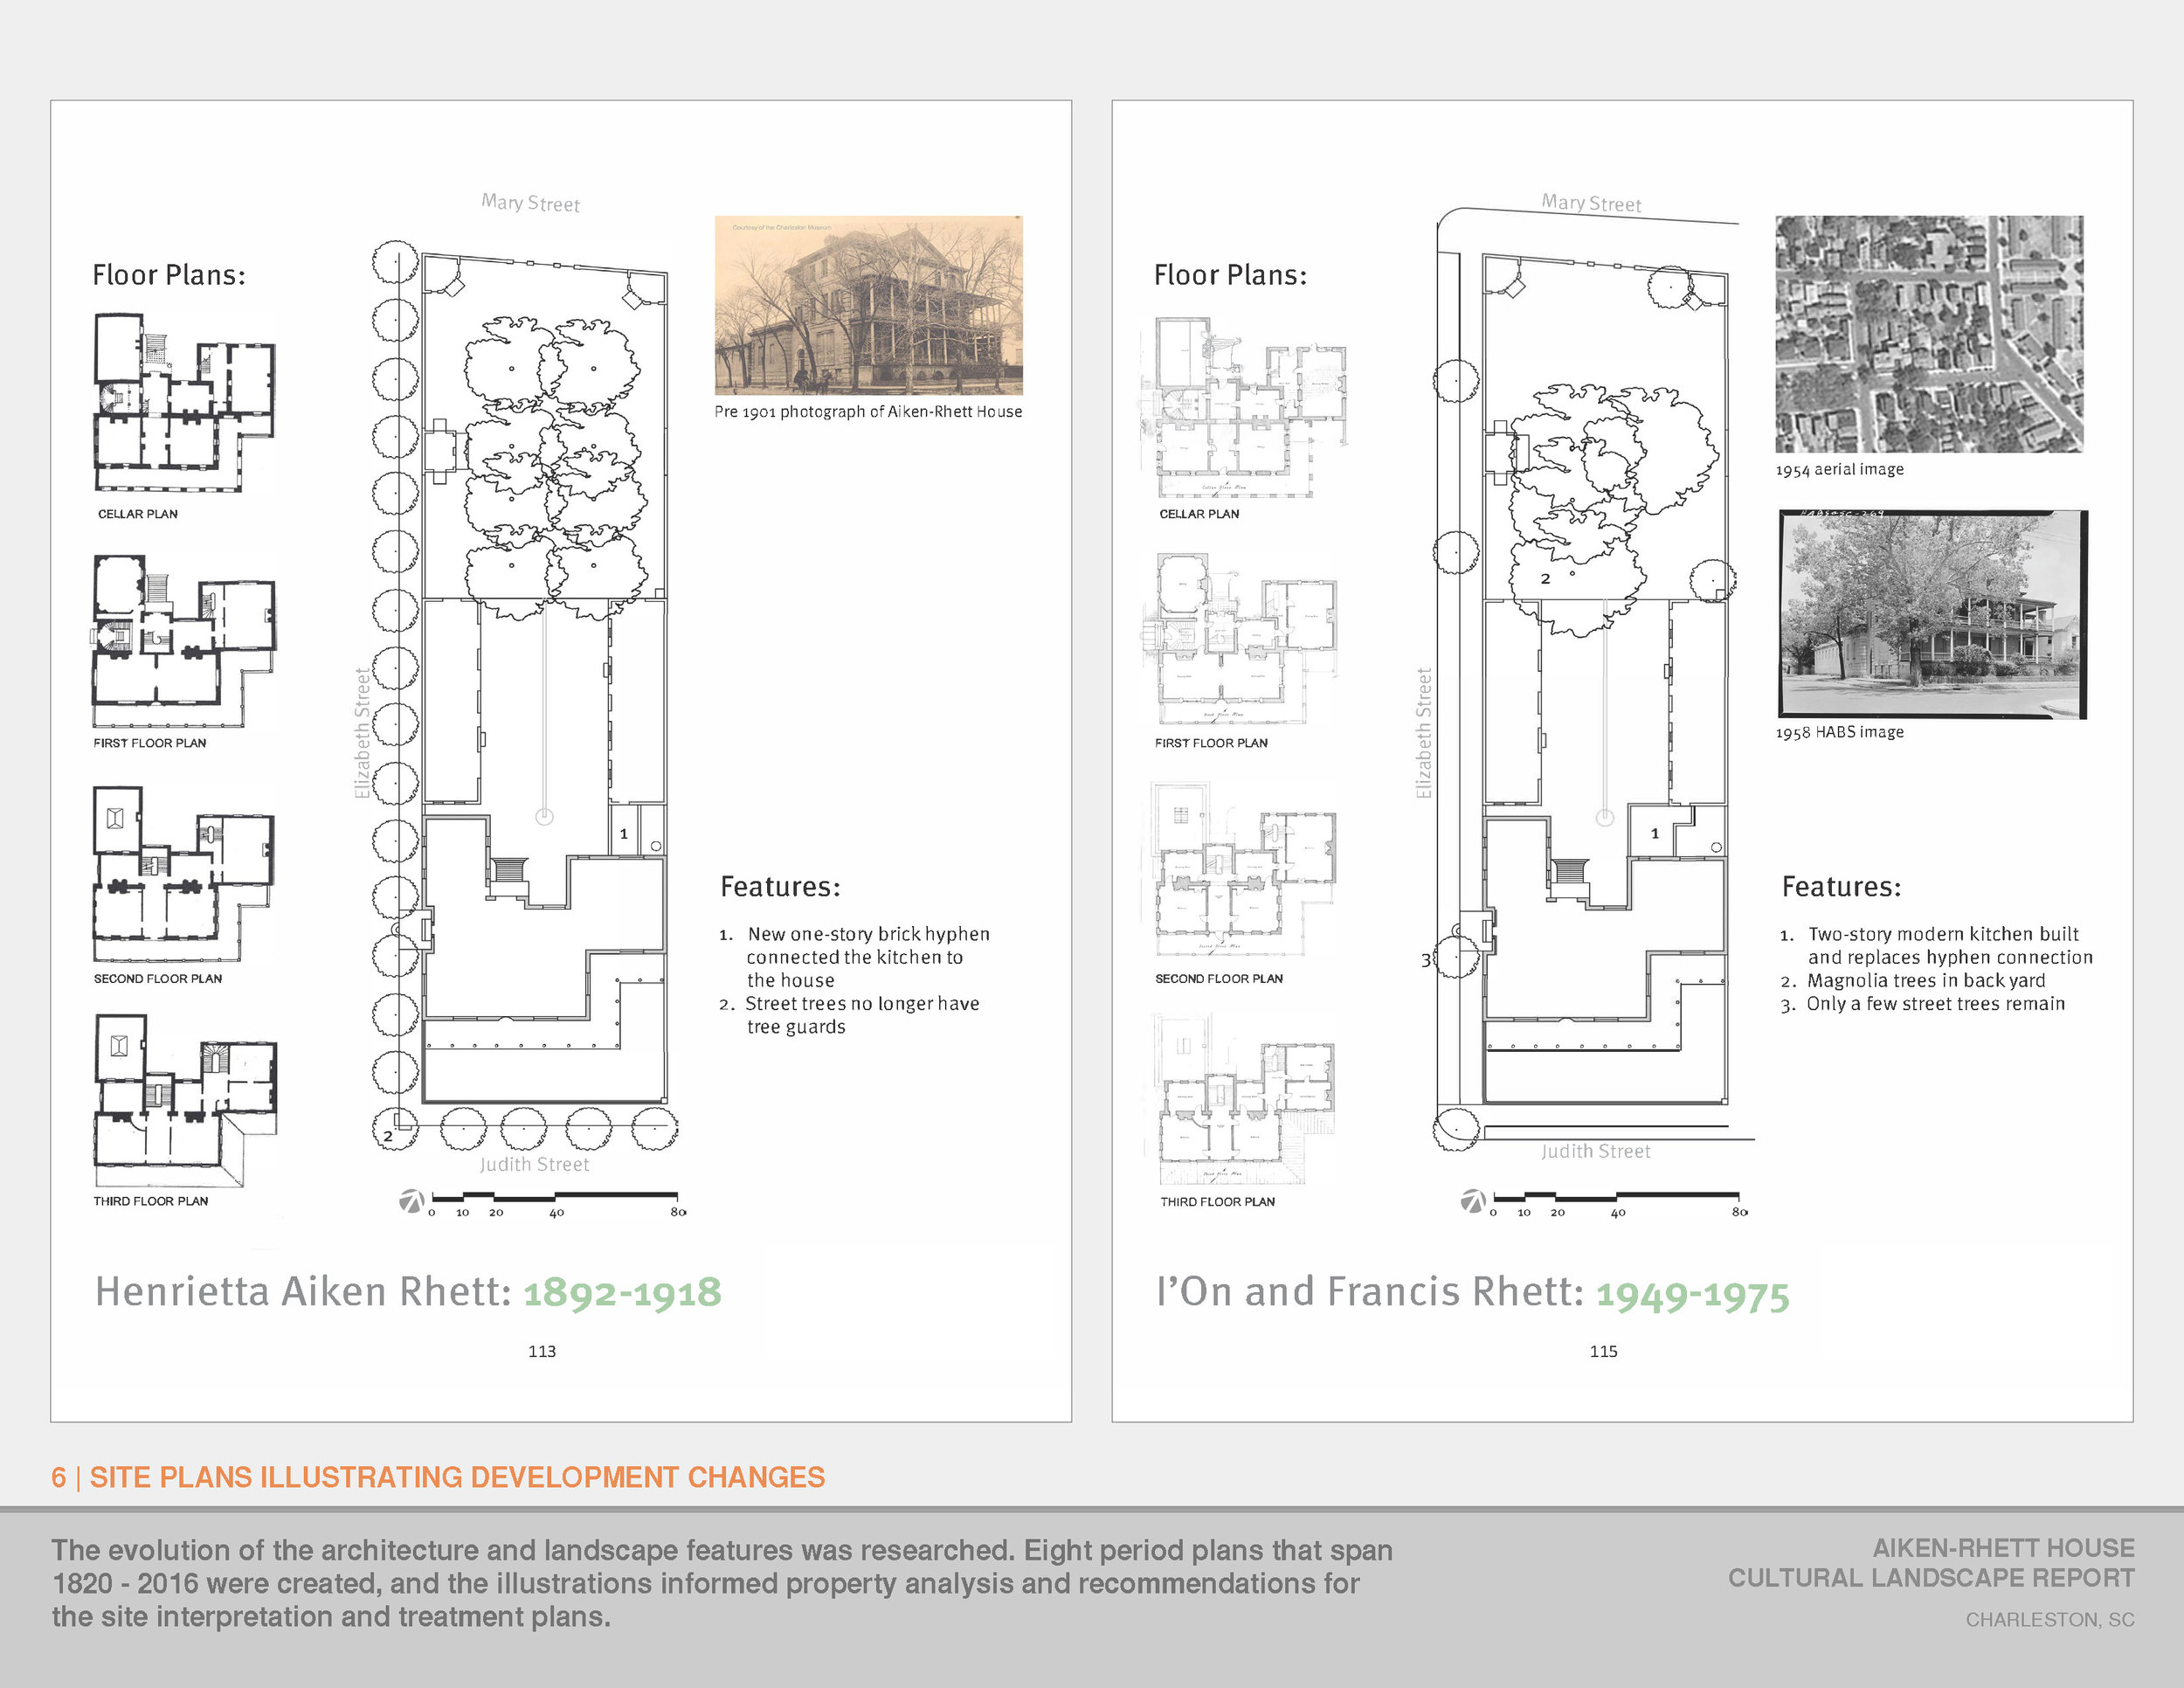 Suzanne Turner Associates - Aiken-Rhett House Report_Page_06.jpg